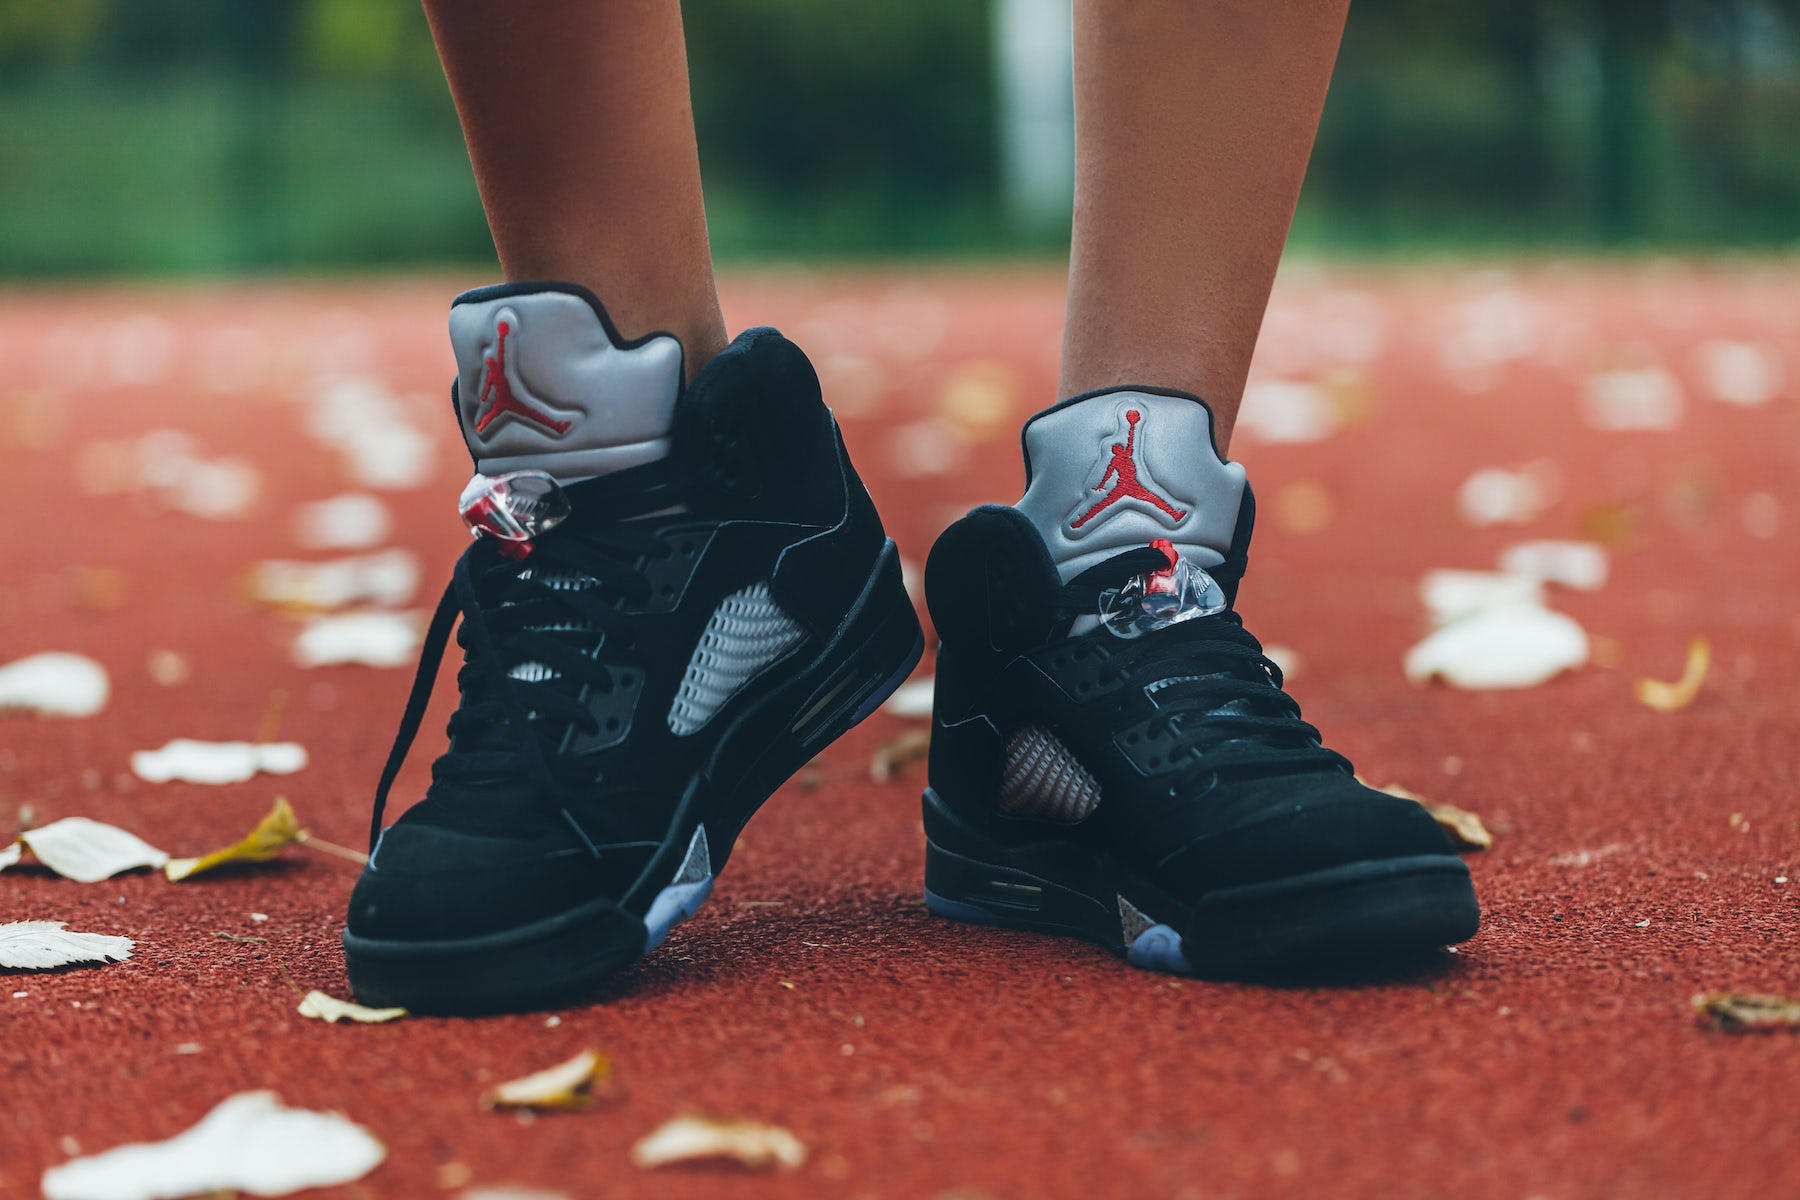 Nike Air Jordan 5 Basketball Shoes   Source: Shutterstock